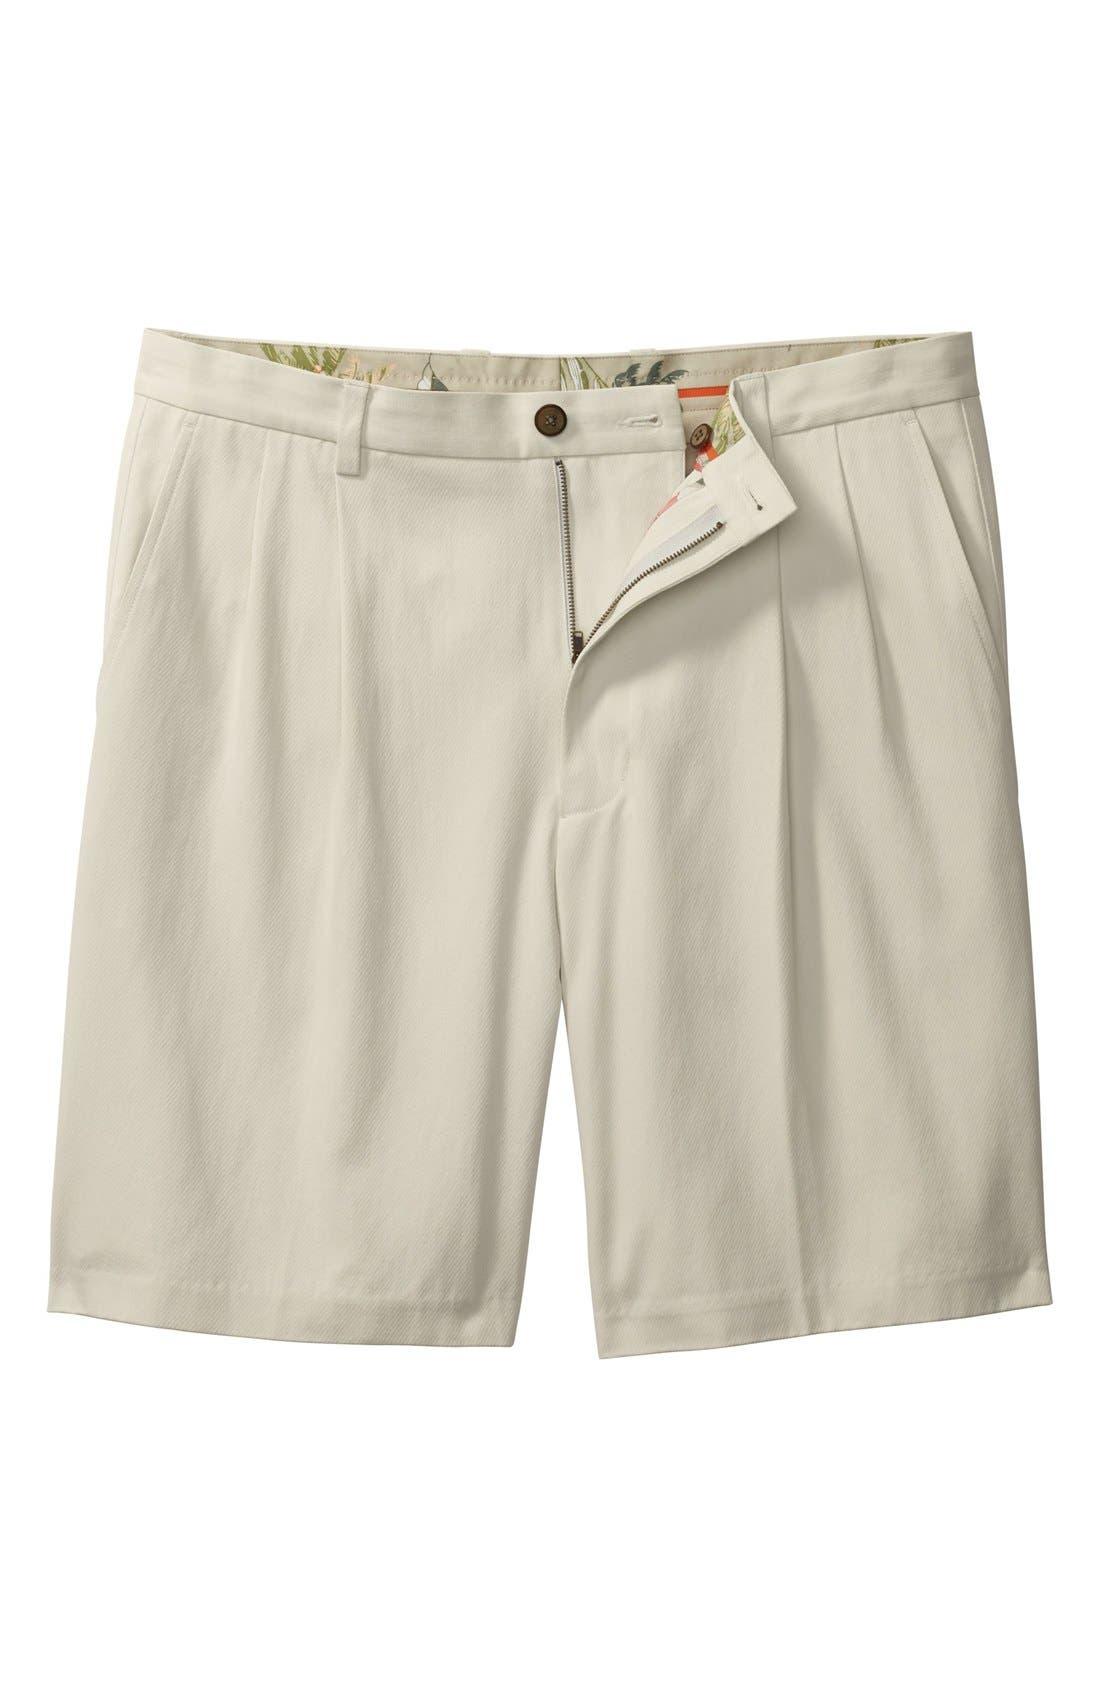 St. Thomas Pleated Shorts,                             Alternate thumbnail 3, color,                             Abbey Stone